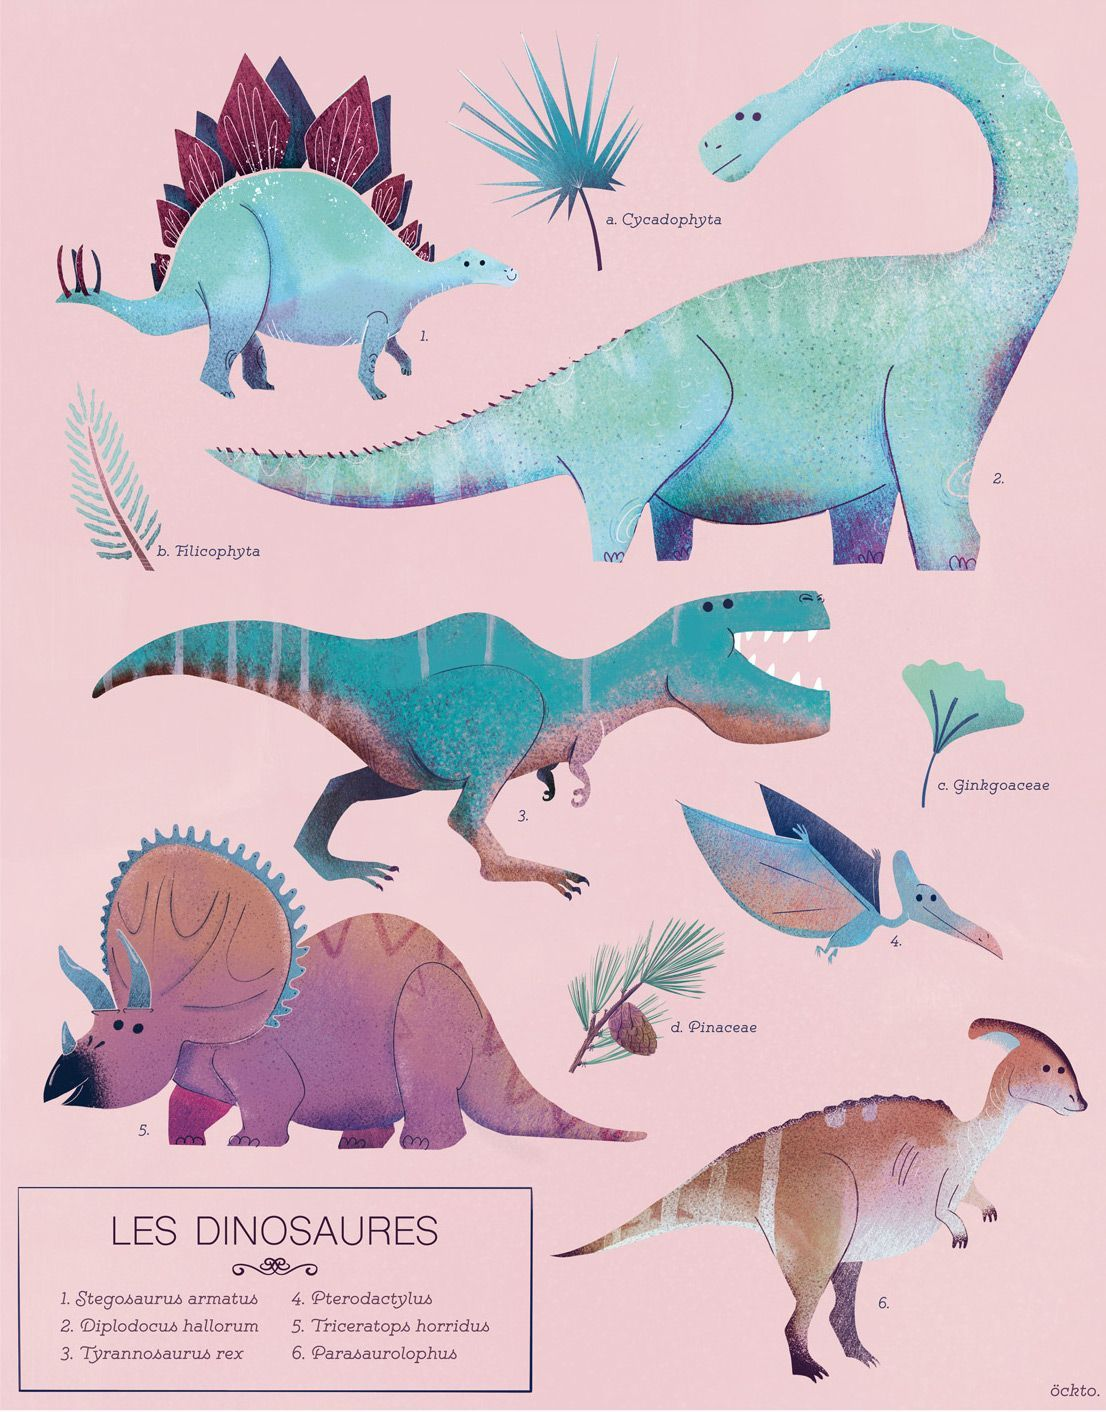 affiche de dinosaures #dinosaurillustration affiche de dinosaures #dinosaurillustration